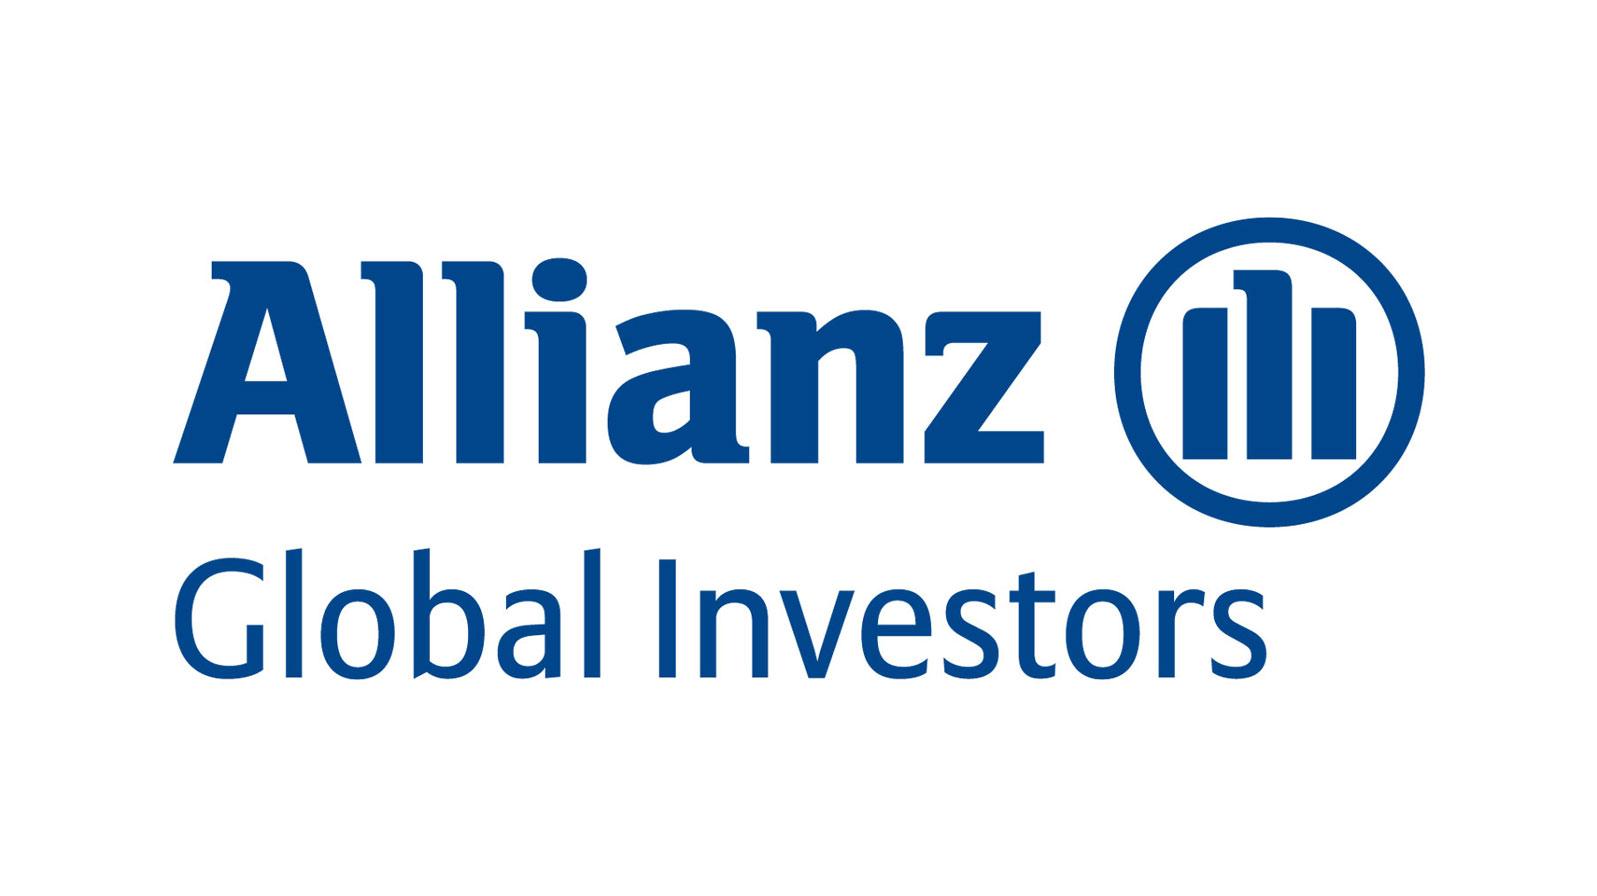 Allianz Global Investors GmbH